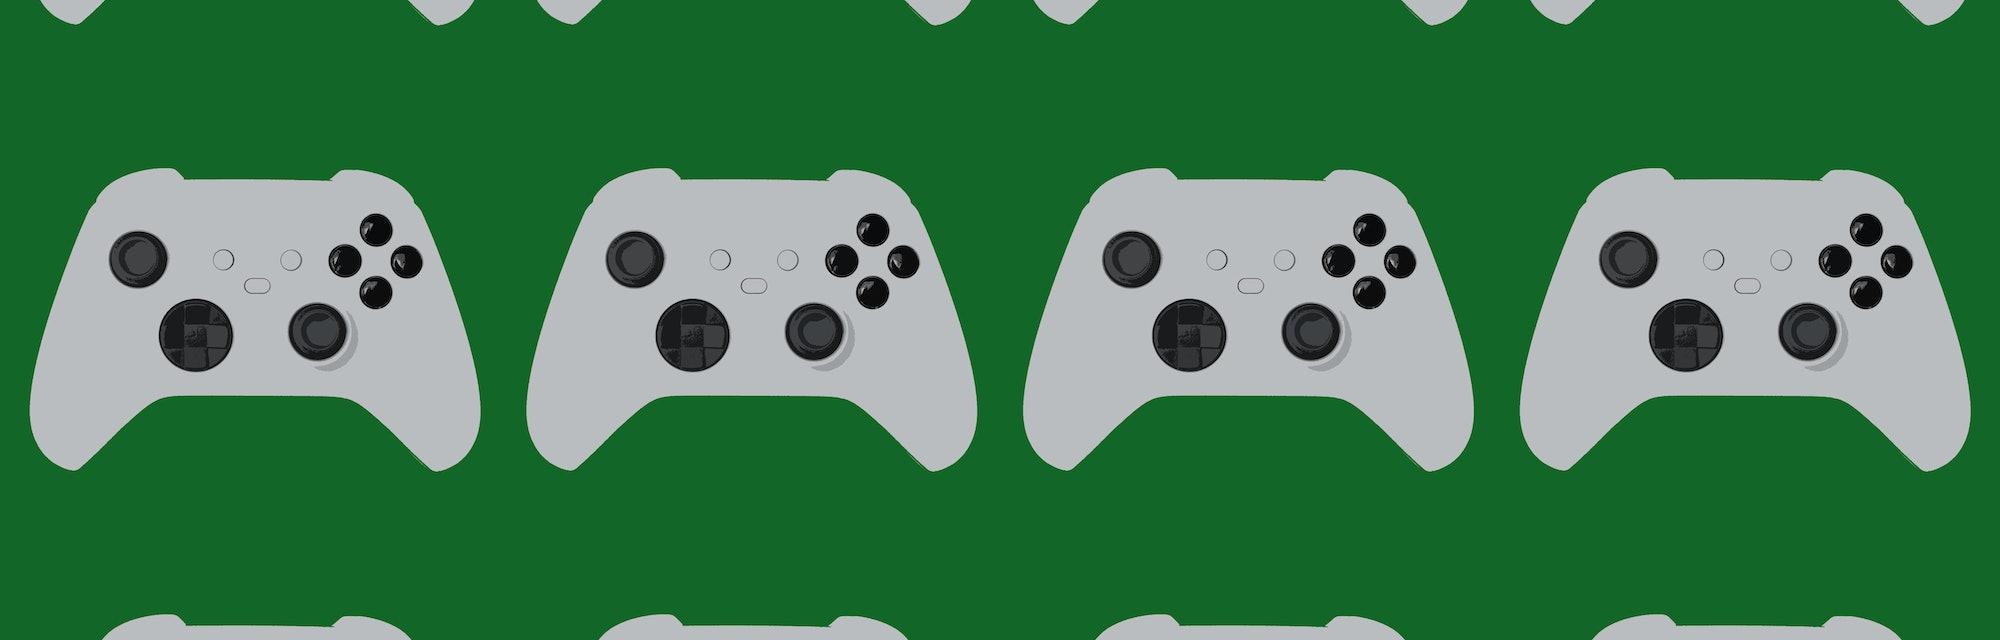 Game controller illustration on green background